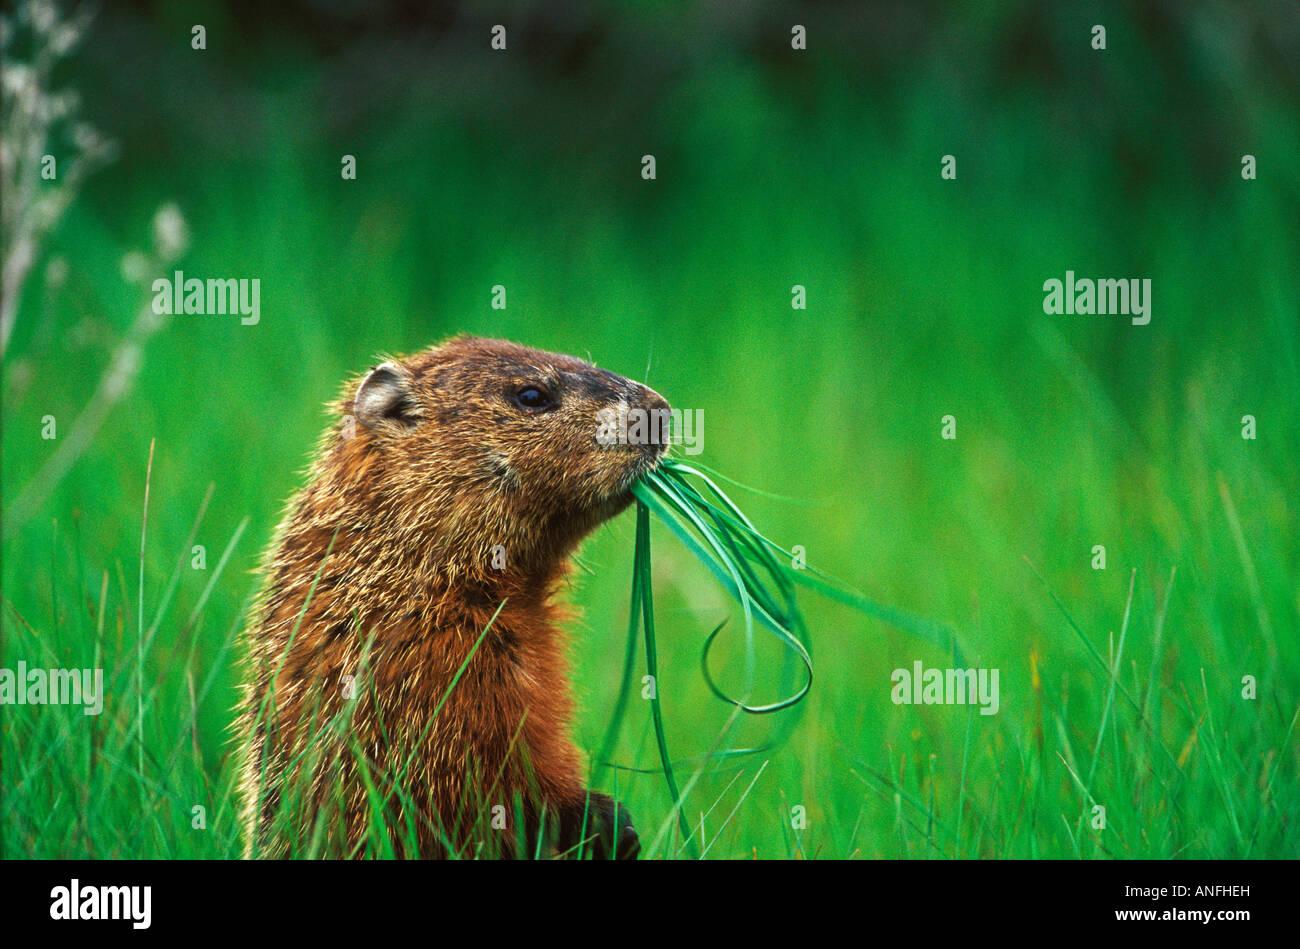 Woodchuck (Groundhog) (Marmota monax) chewing grass, Prince Edward Point National Wildlife Area, Ontario, Canada. - Stock Image